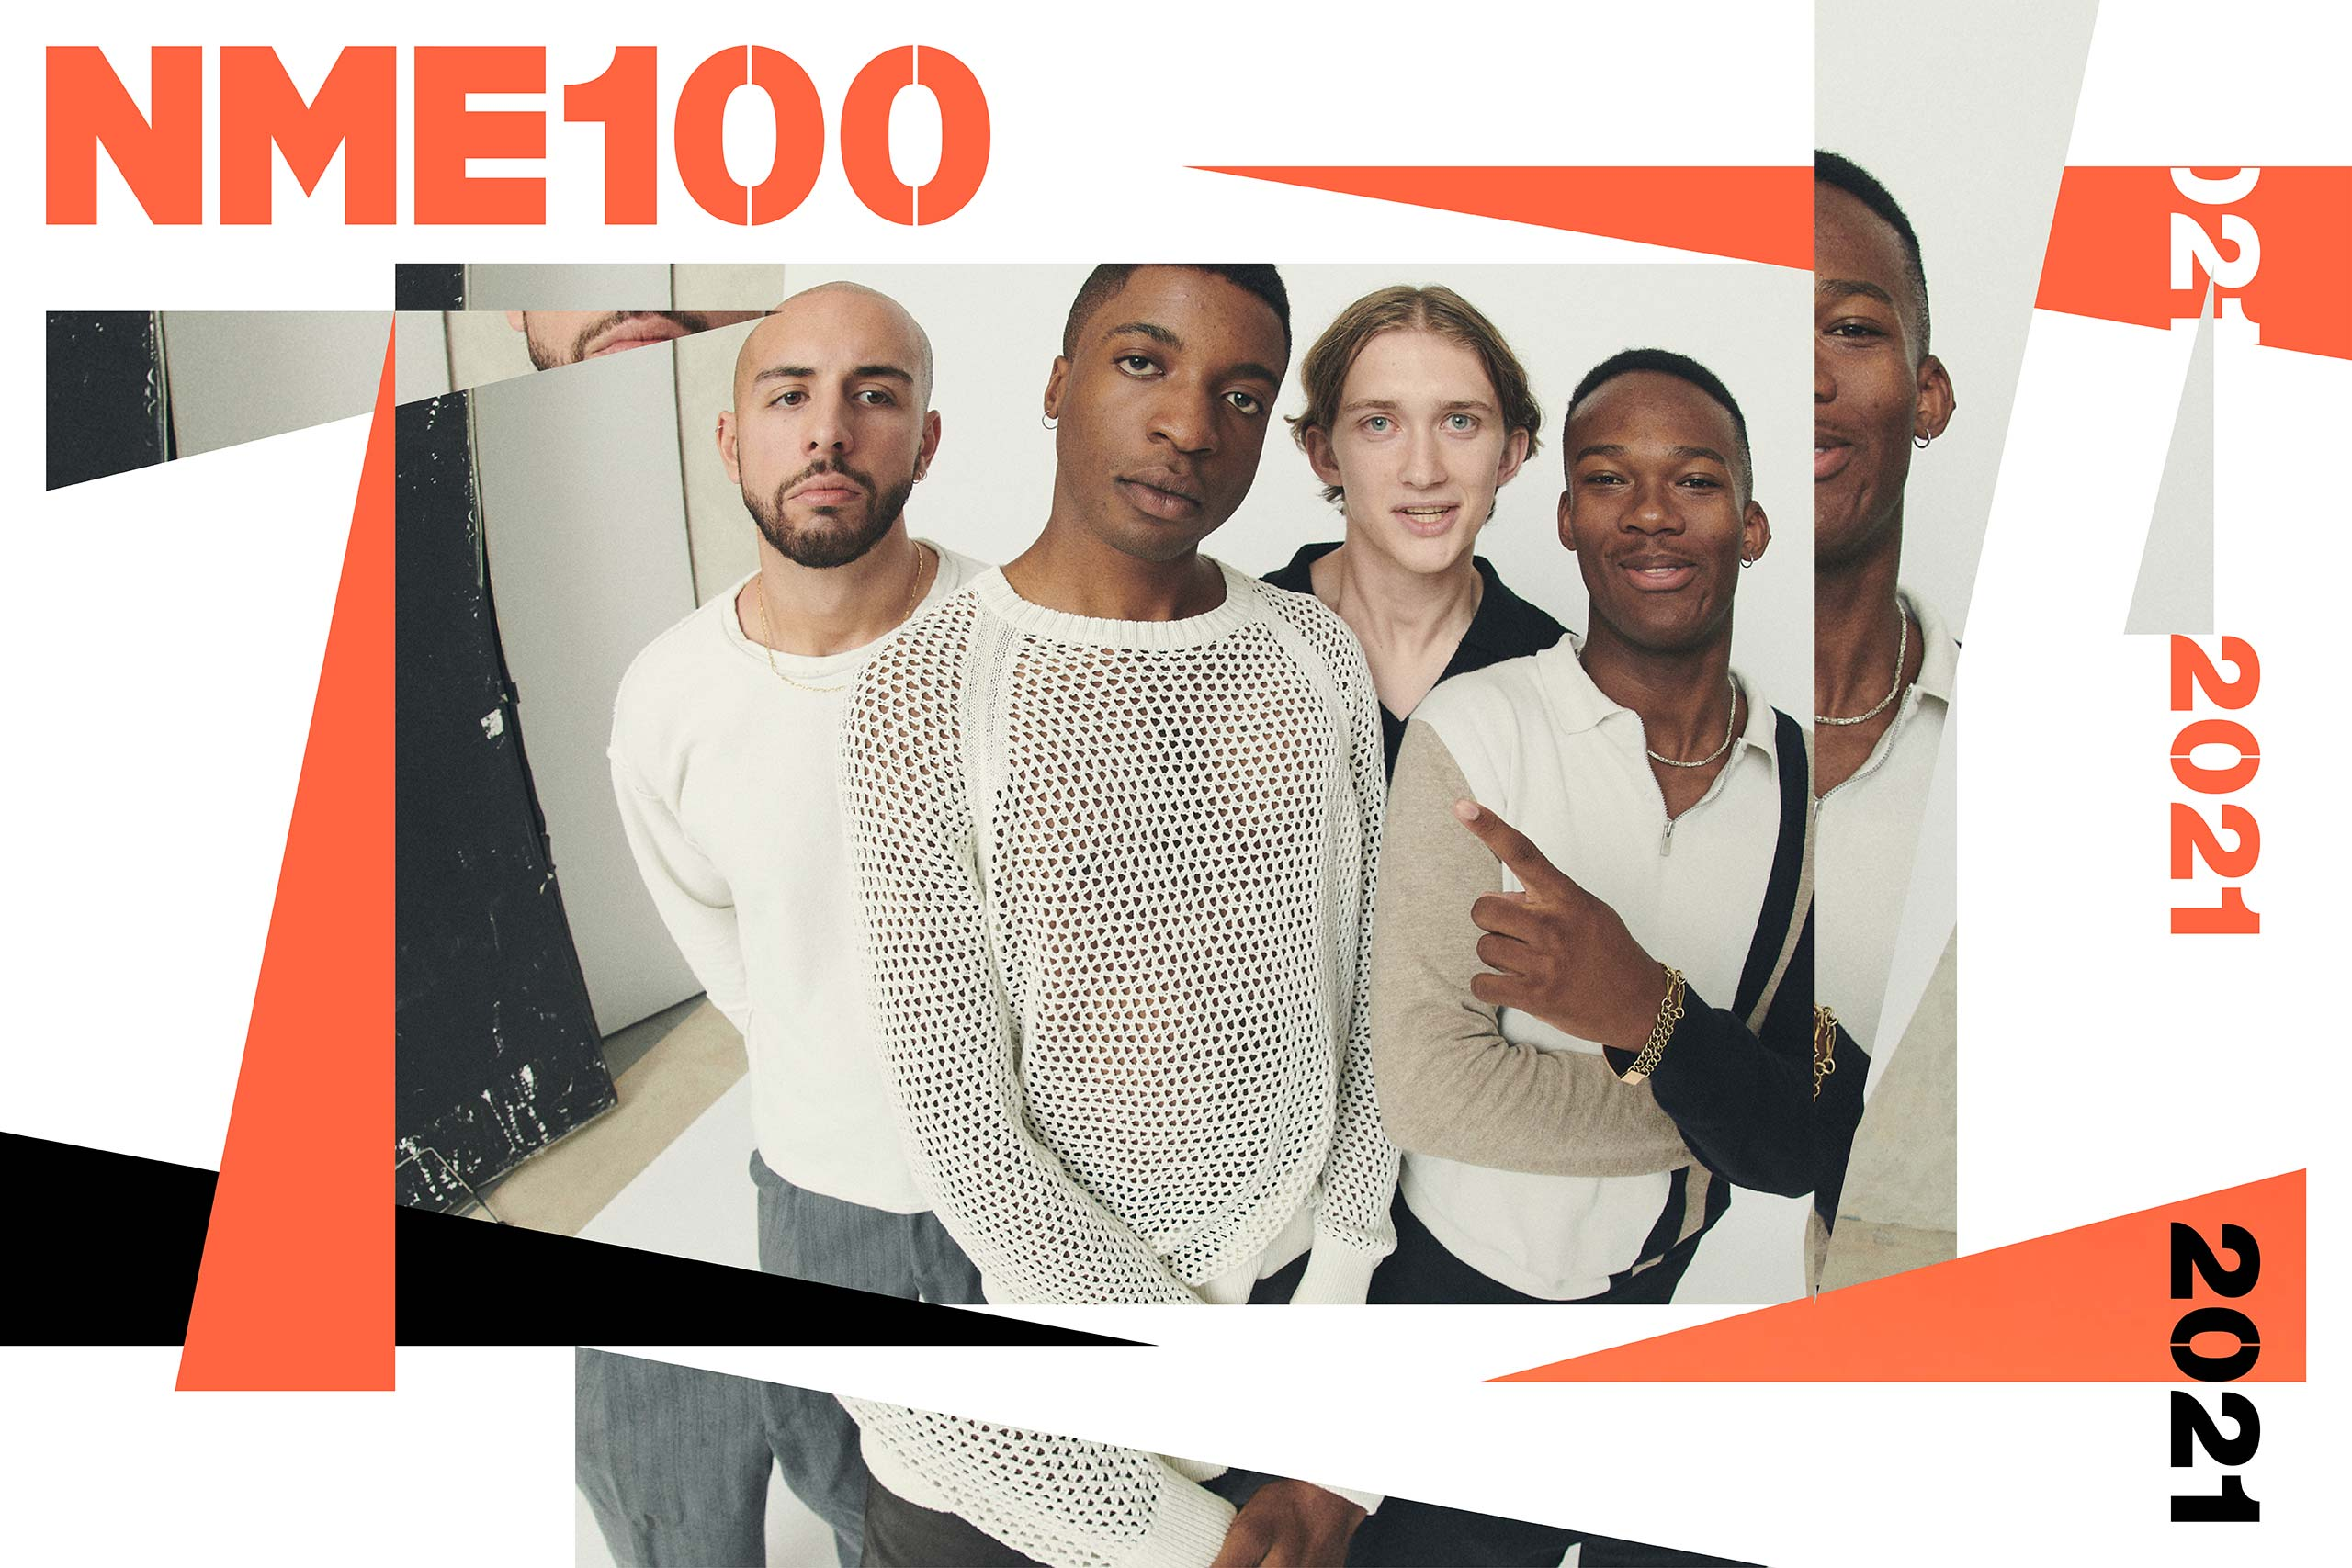 NME 100 malady